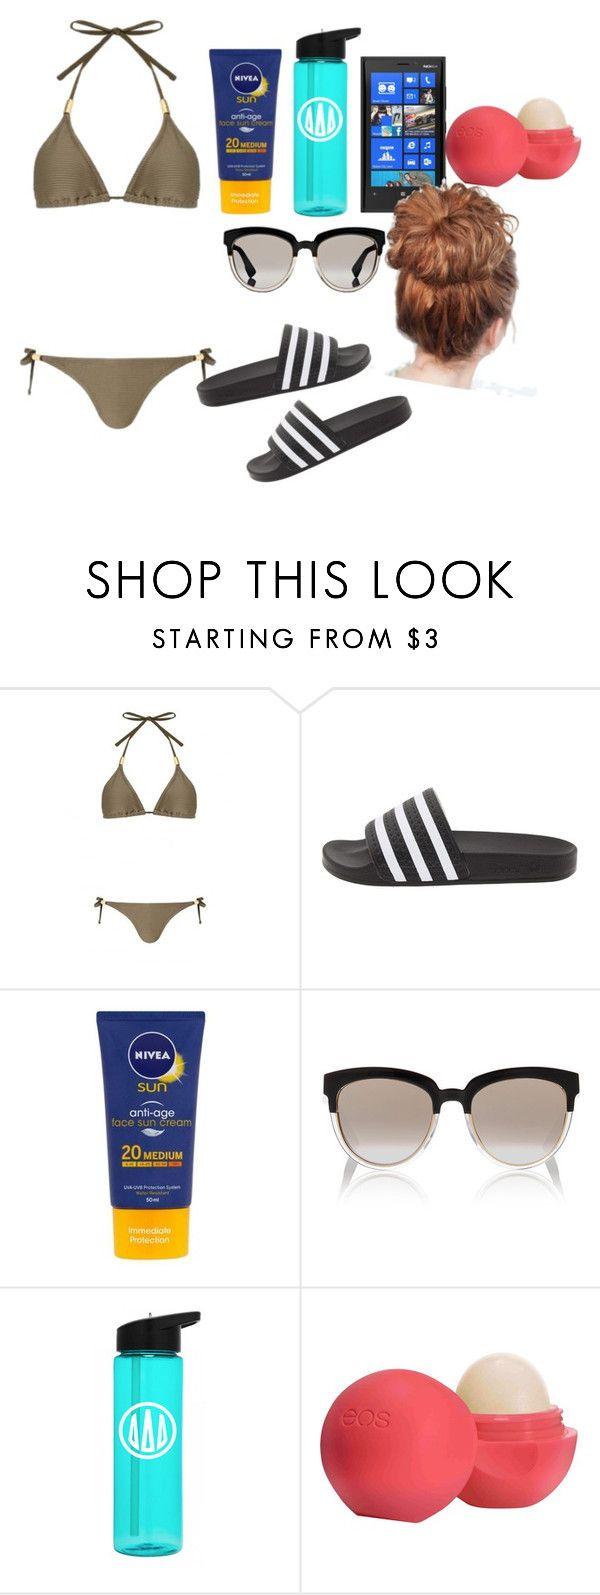 """Love island "" by xmiajohn ❤ liked on Polyvore featuring adidas, Nivea, Christian Dior, Nokia, Eos, GetTheLook, redwhiteandblue, Leggings, beachhair and WardrobeStaples"